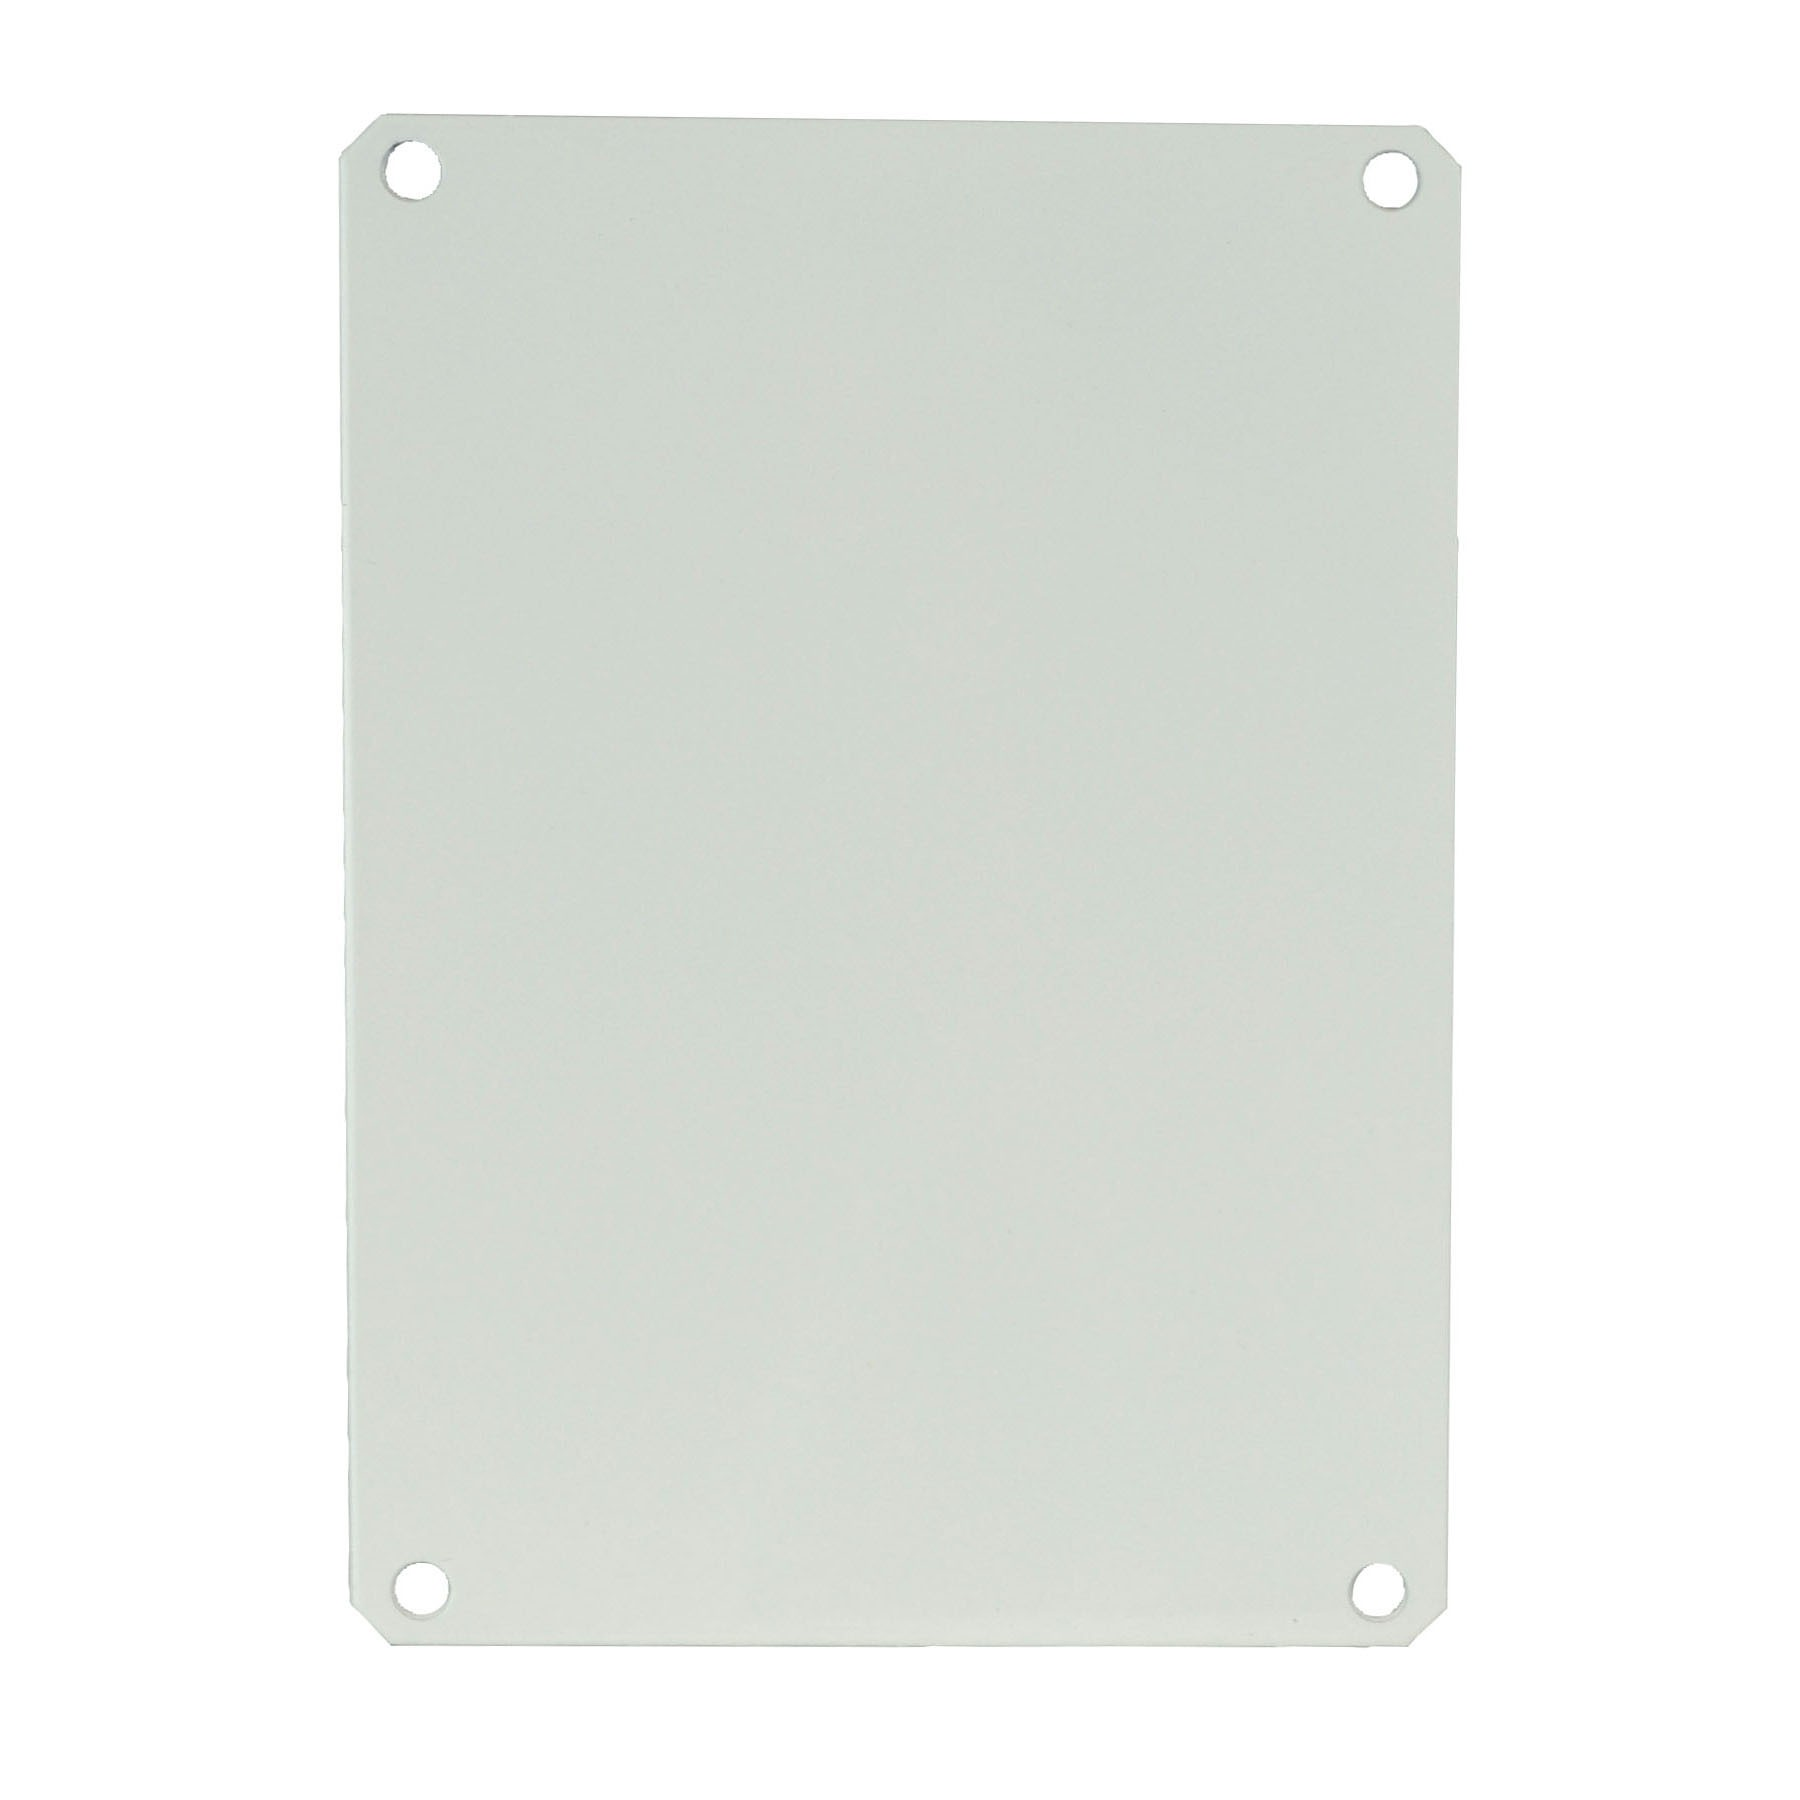 "Carbon Steel Back Panel for 8"" x 6"" Enclosures"